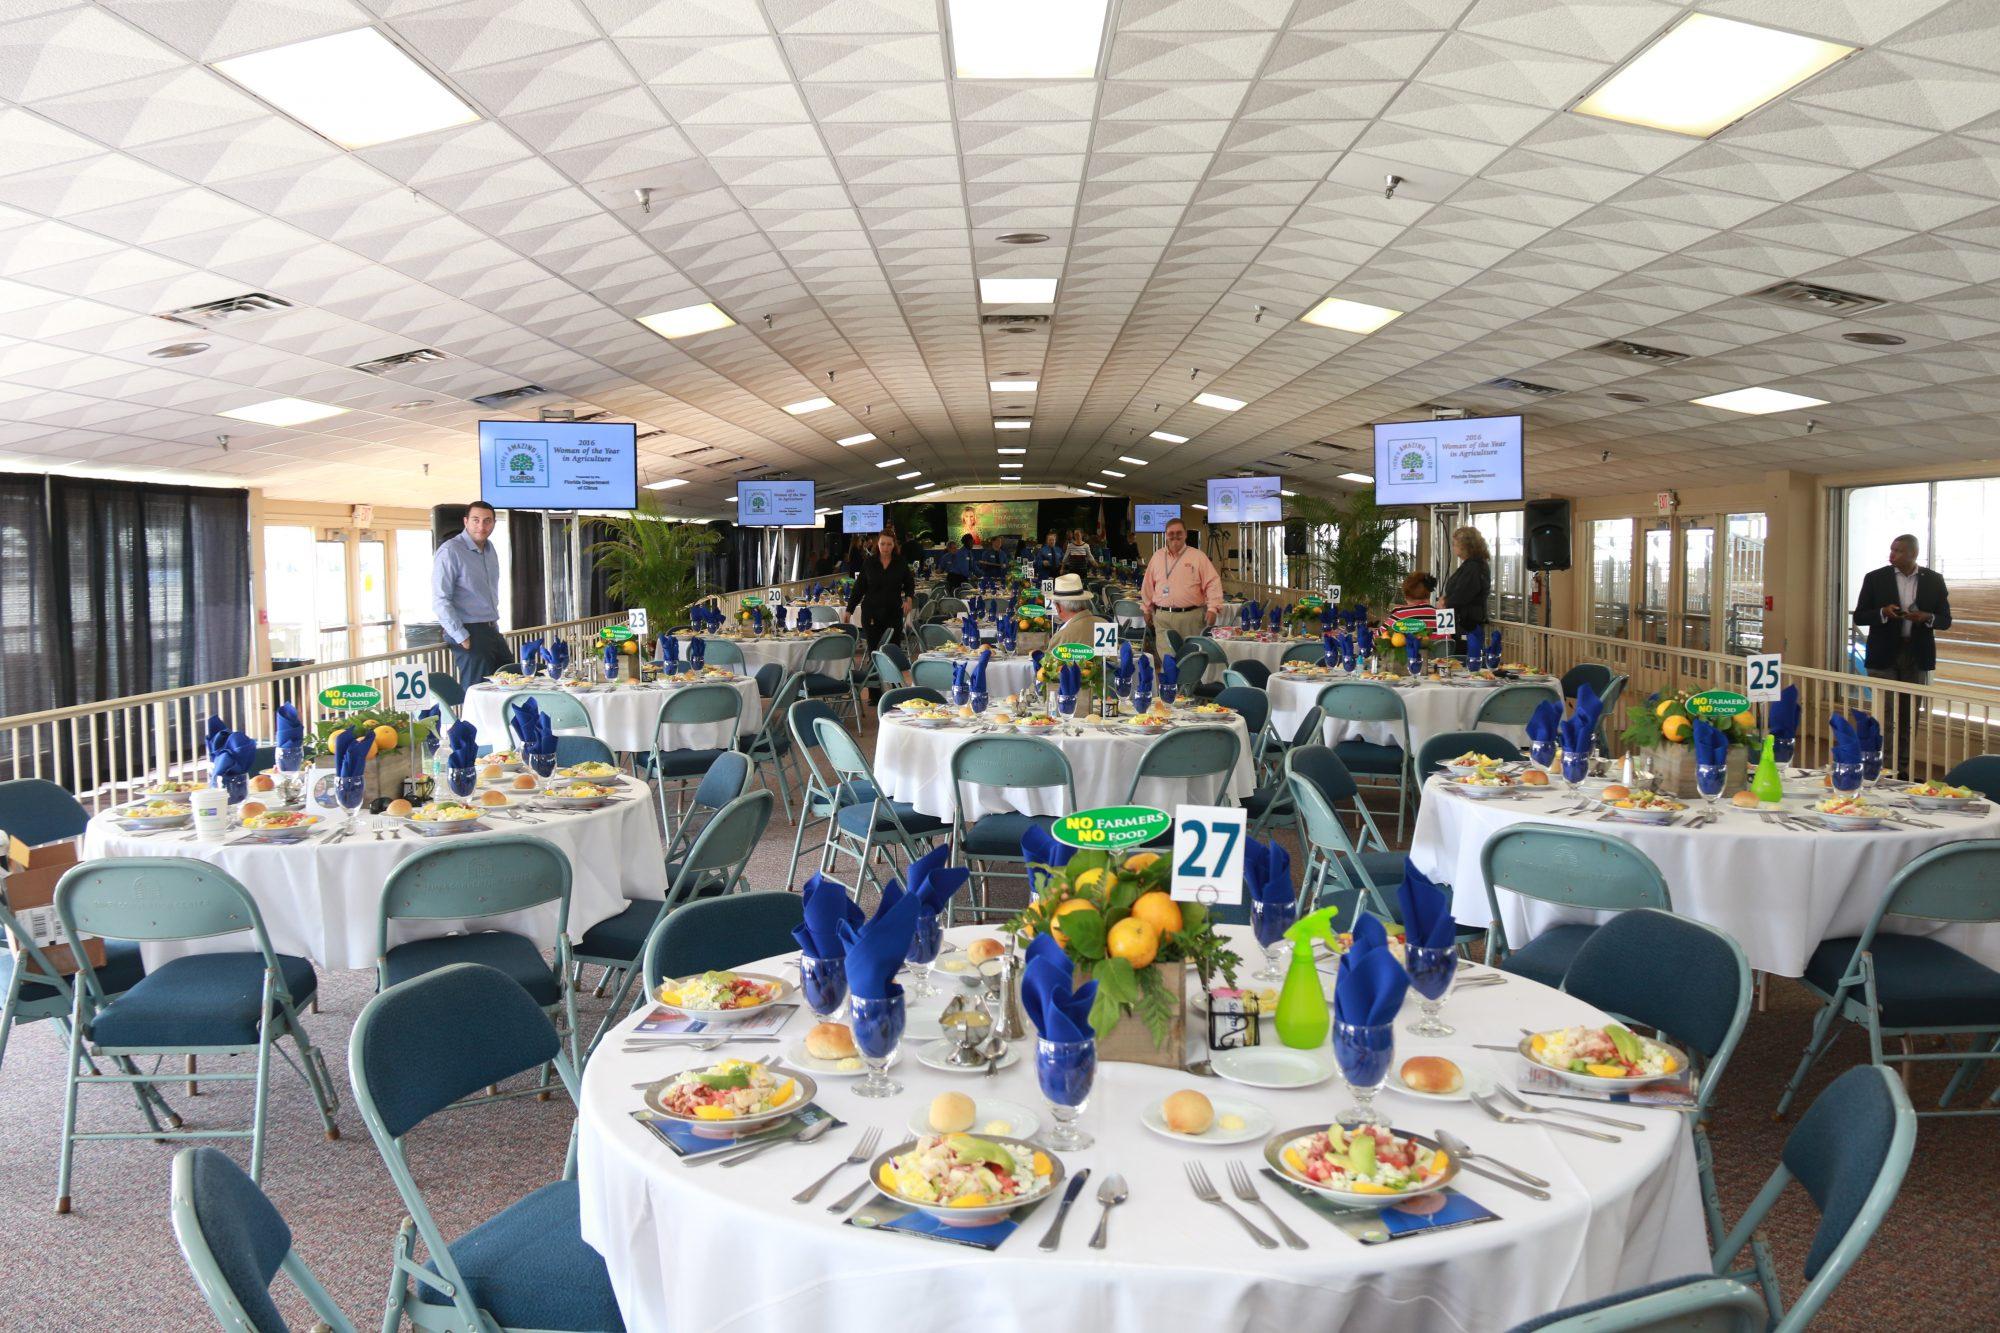 Equestrian – Florida State Fair With Regard To Florida State Fairgrounds Calendar Of Events